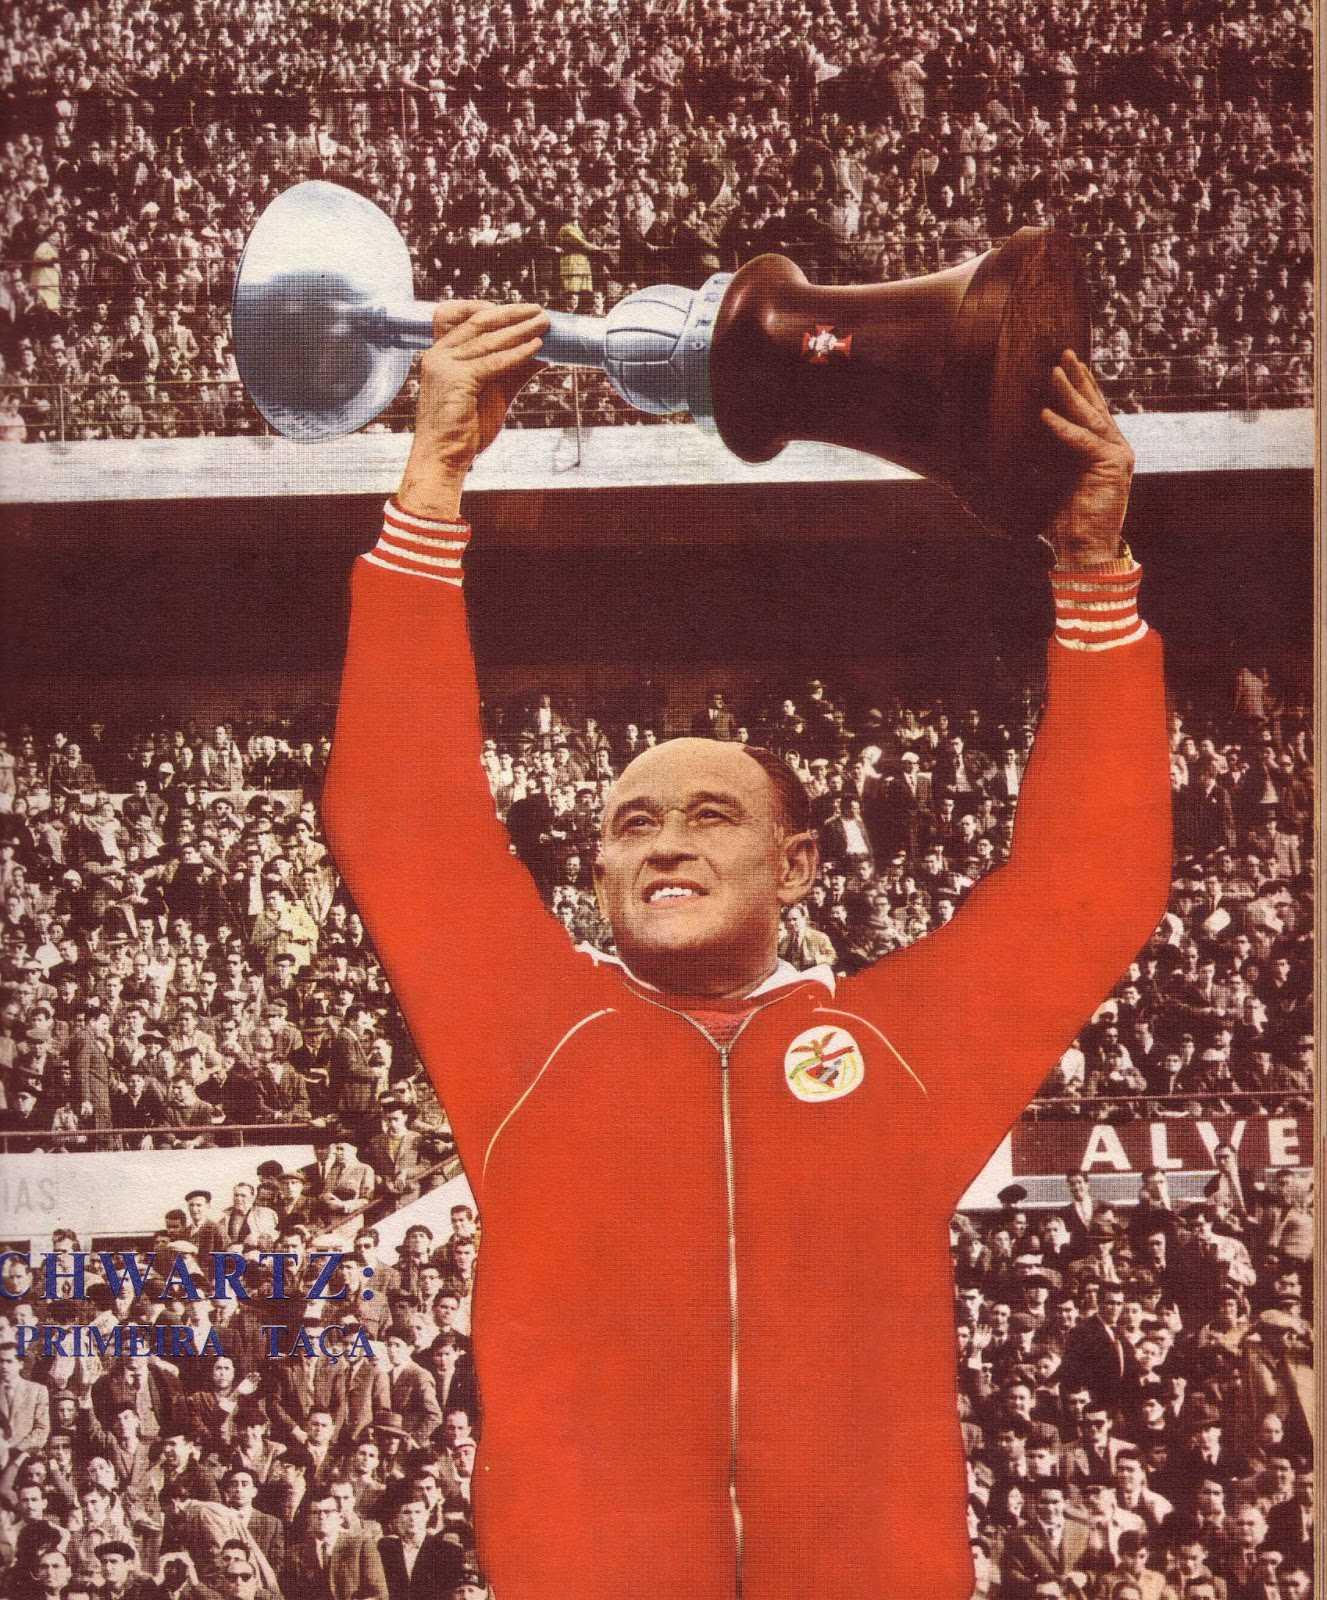 Elek Schwartz 1964 - 1965